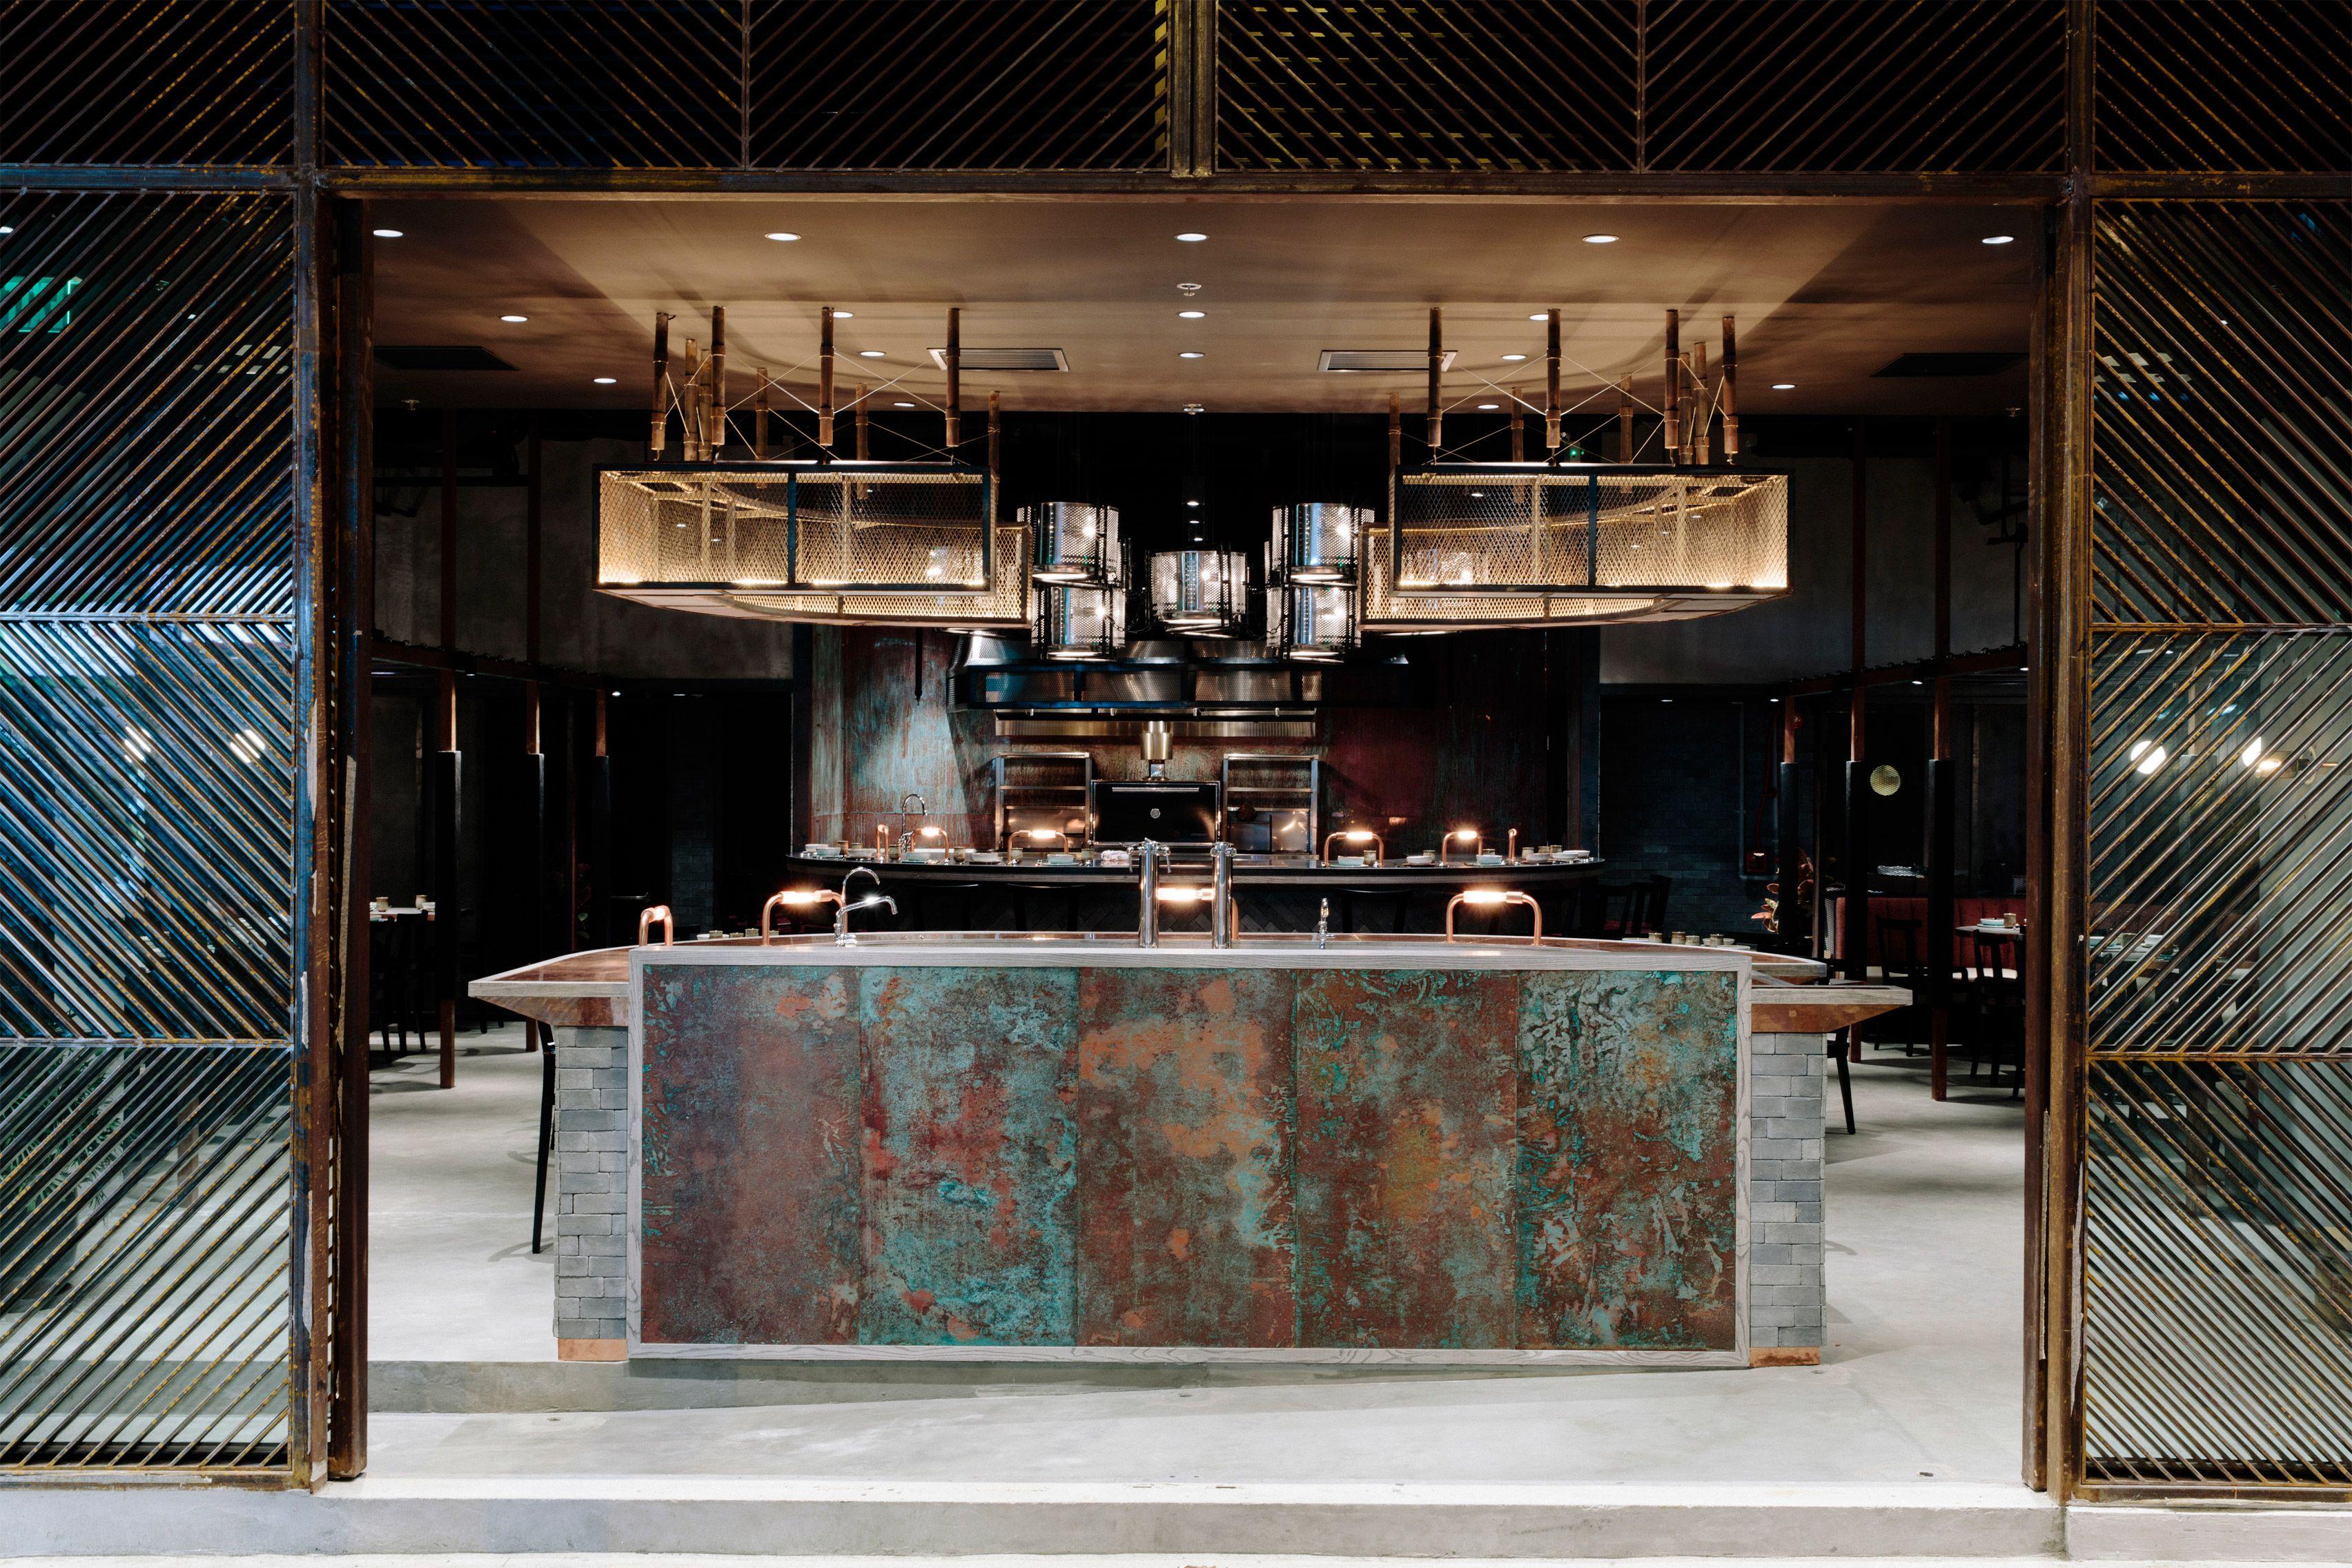 Küchen design hotel rhoda restaurant by joyce wang studio  zukünftige projekte